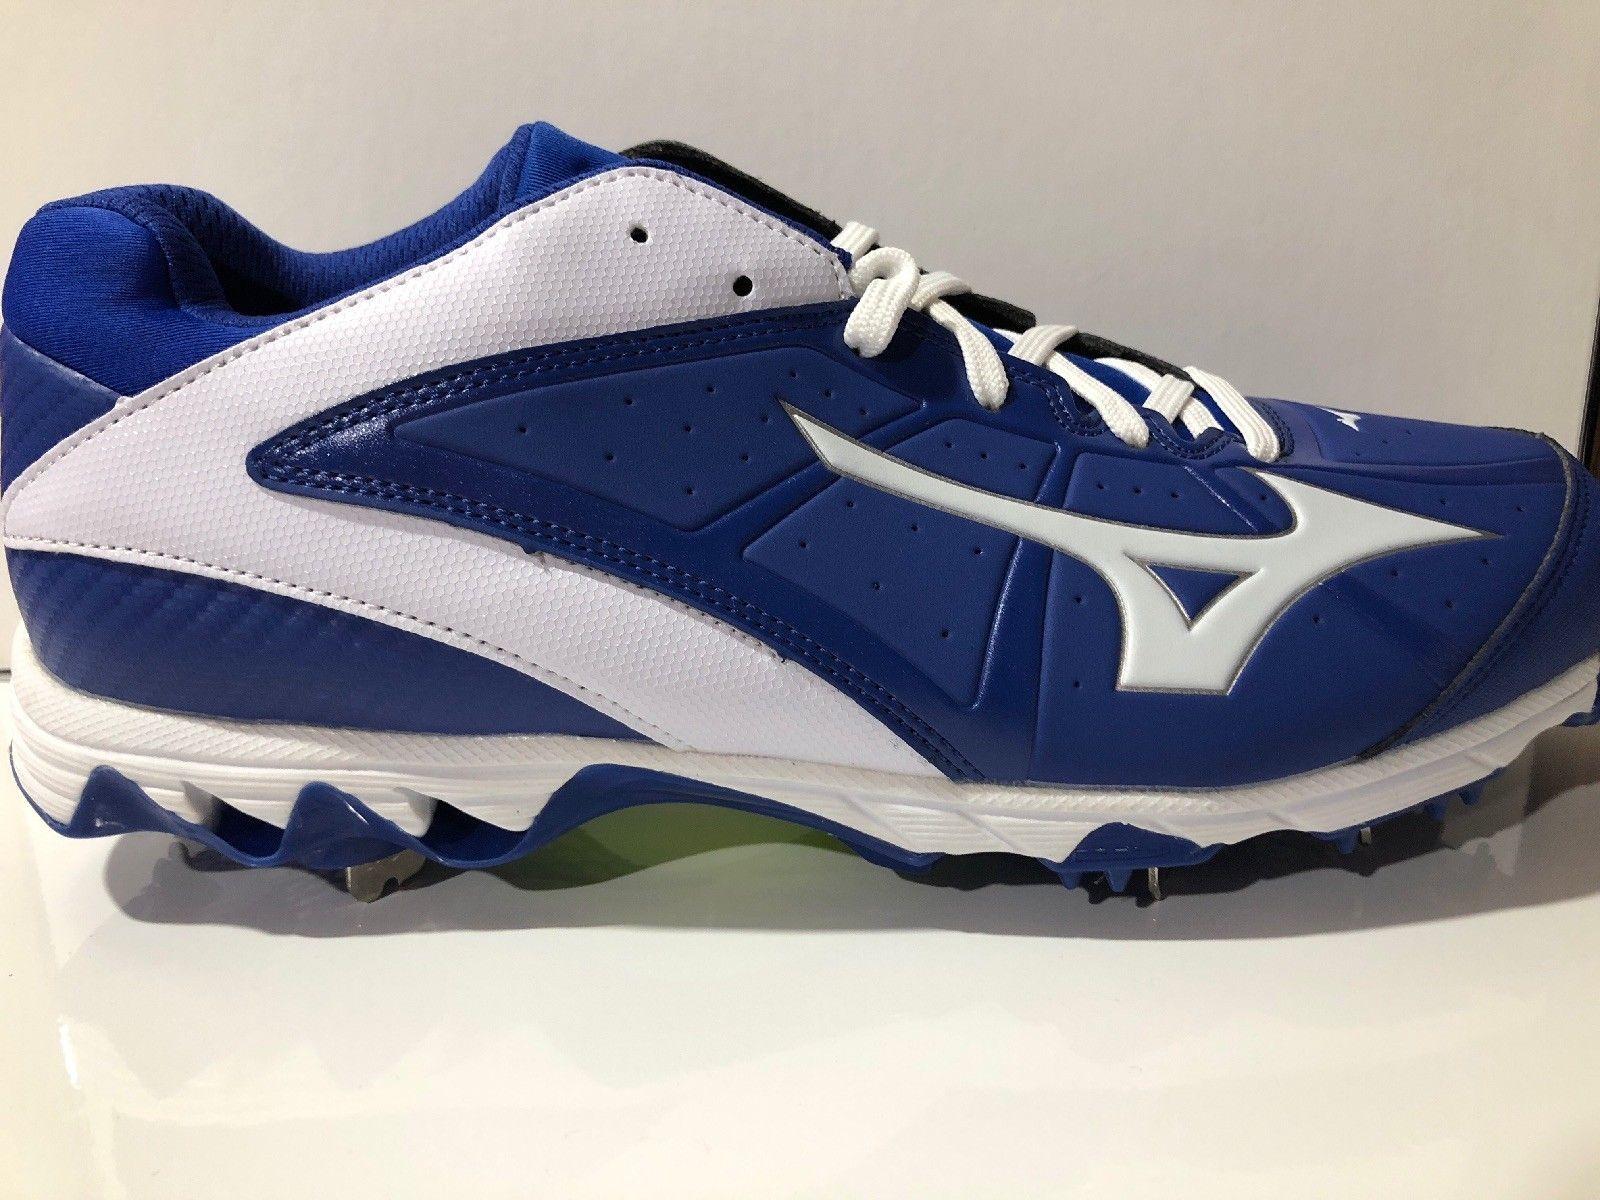 cae8bff04 Womens Softball Cleats 11.5 Mizuno 9-Spike Swift Royal Blue   White 320510